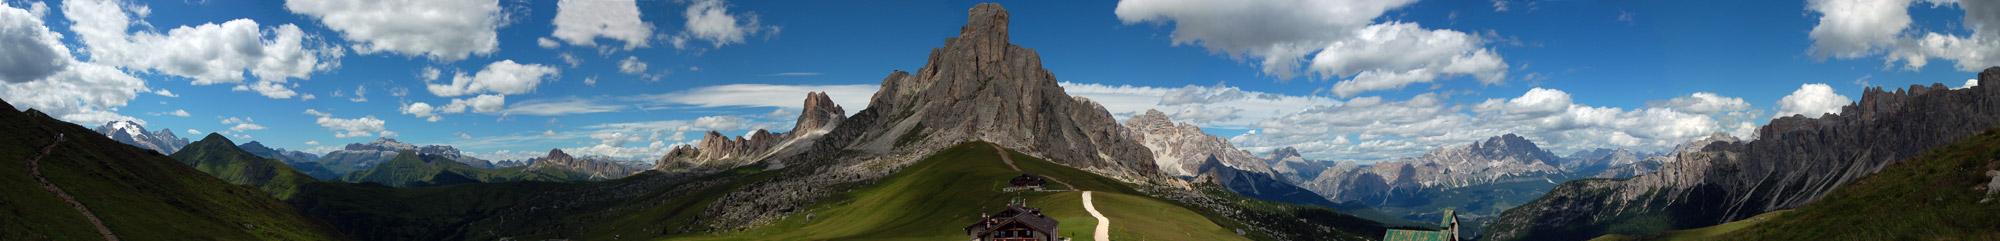 Passo Giau in den Dolomiten